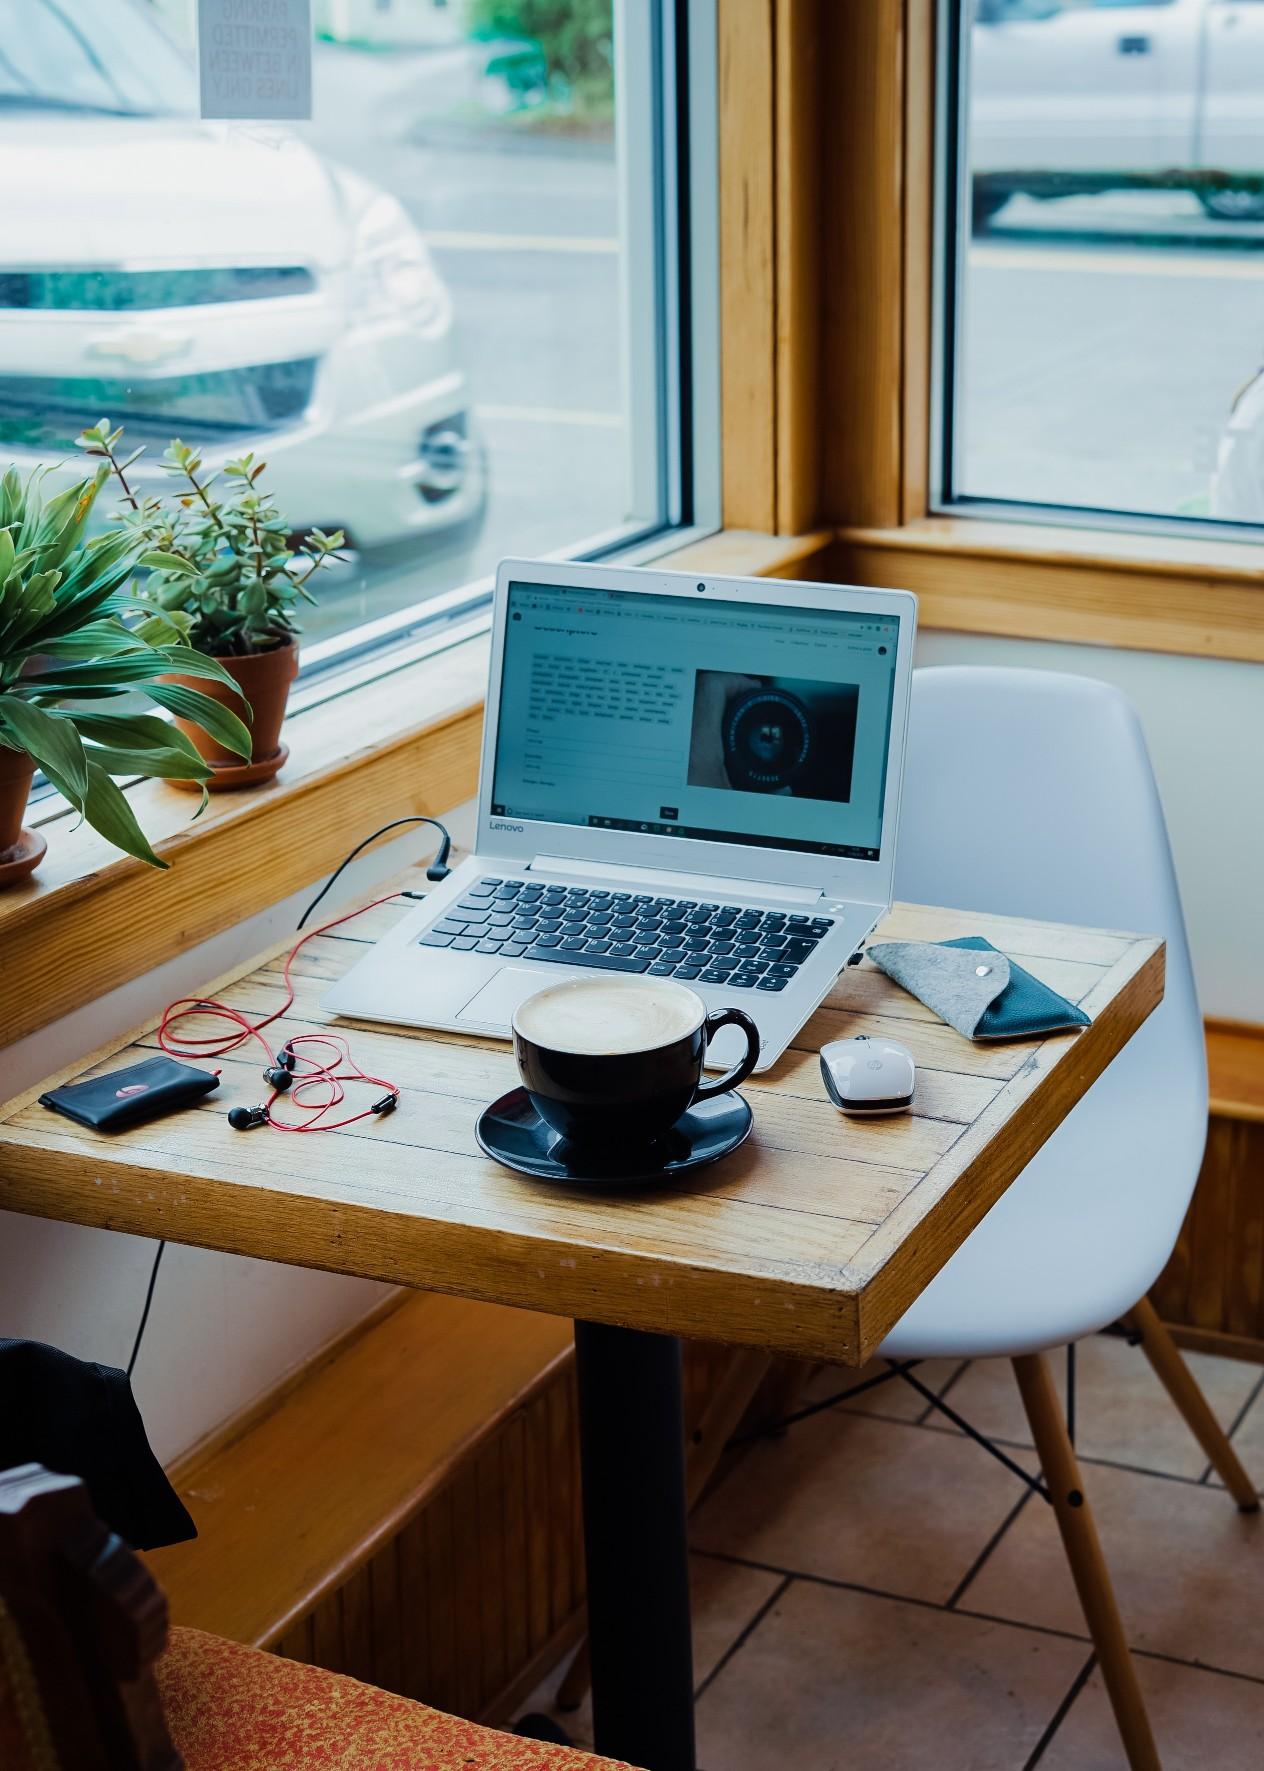 Coworking alternatives to Starbucks